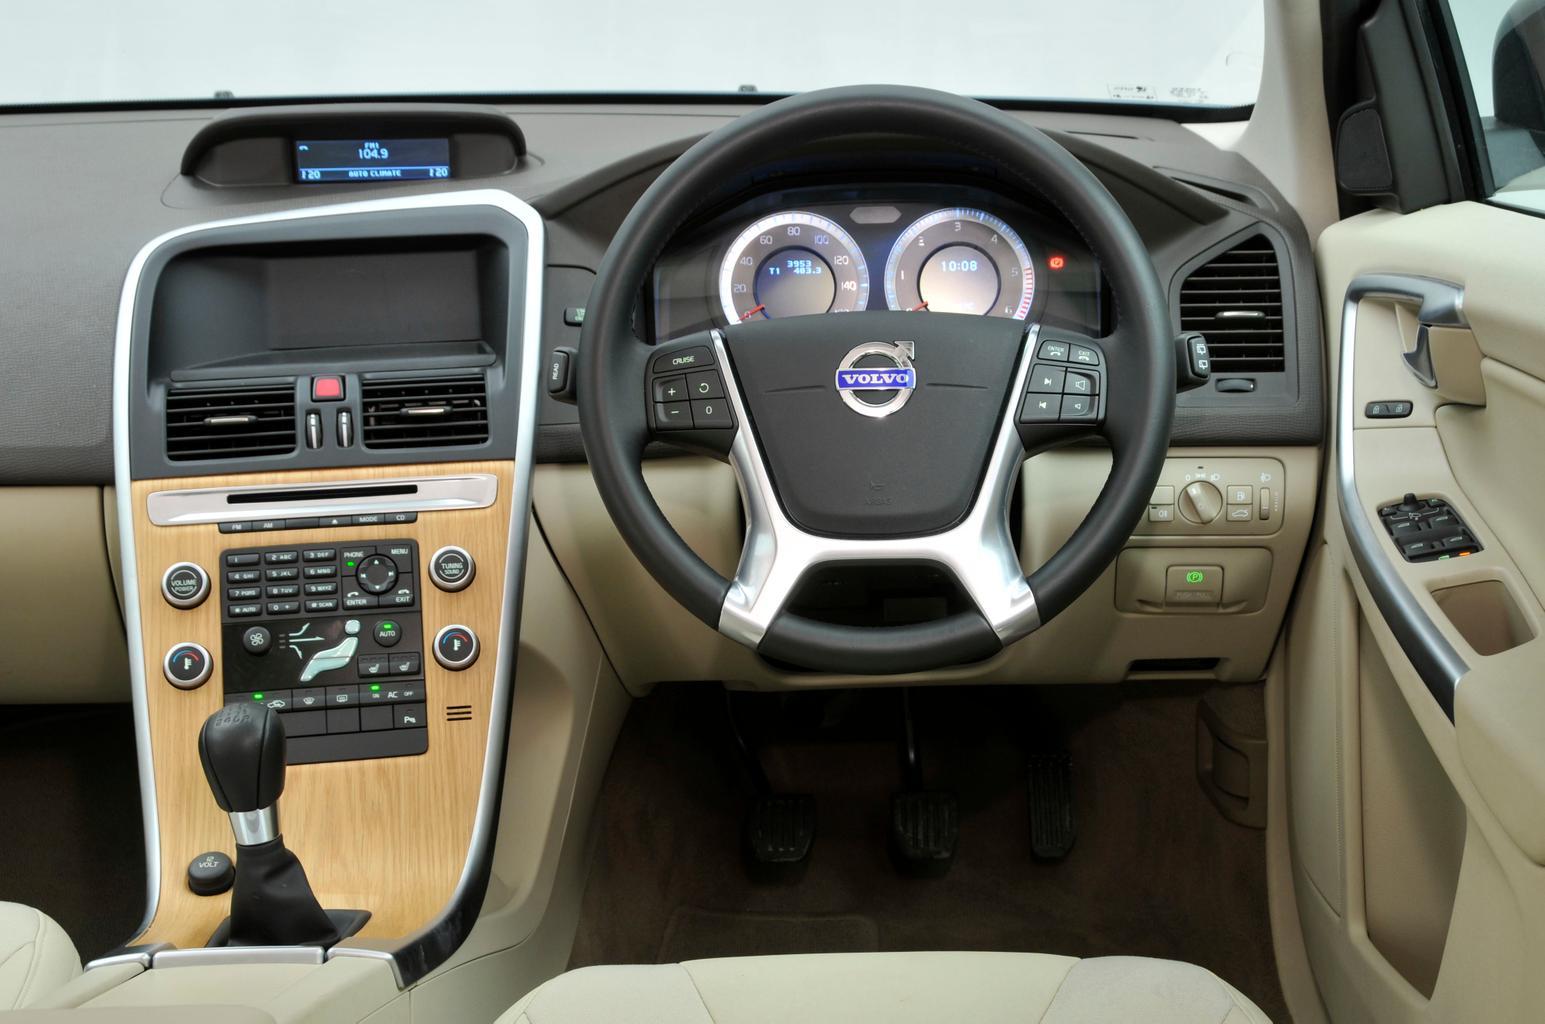 Used test – winter warmers: Audi Q5 vs BMW X3 vs Land Rover Freelander vs Volvo XC60